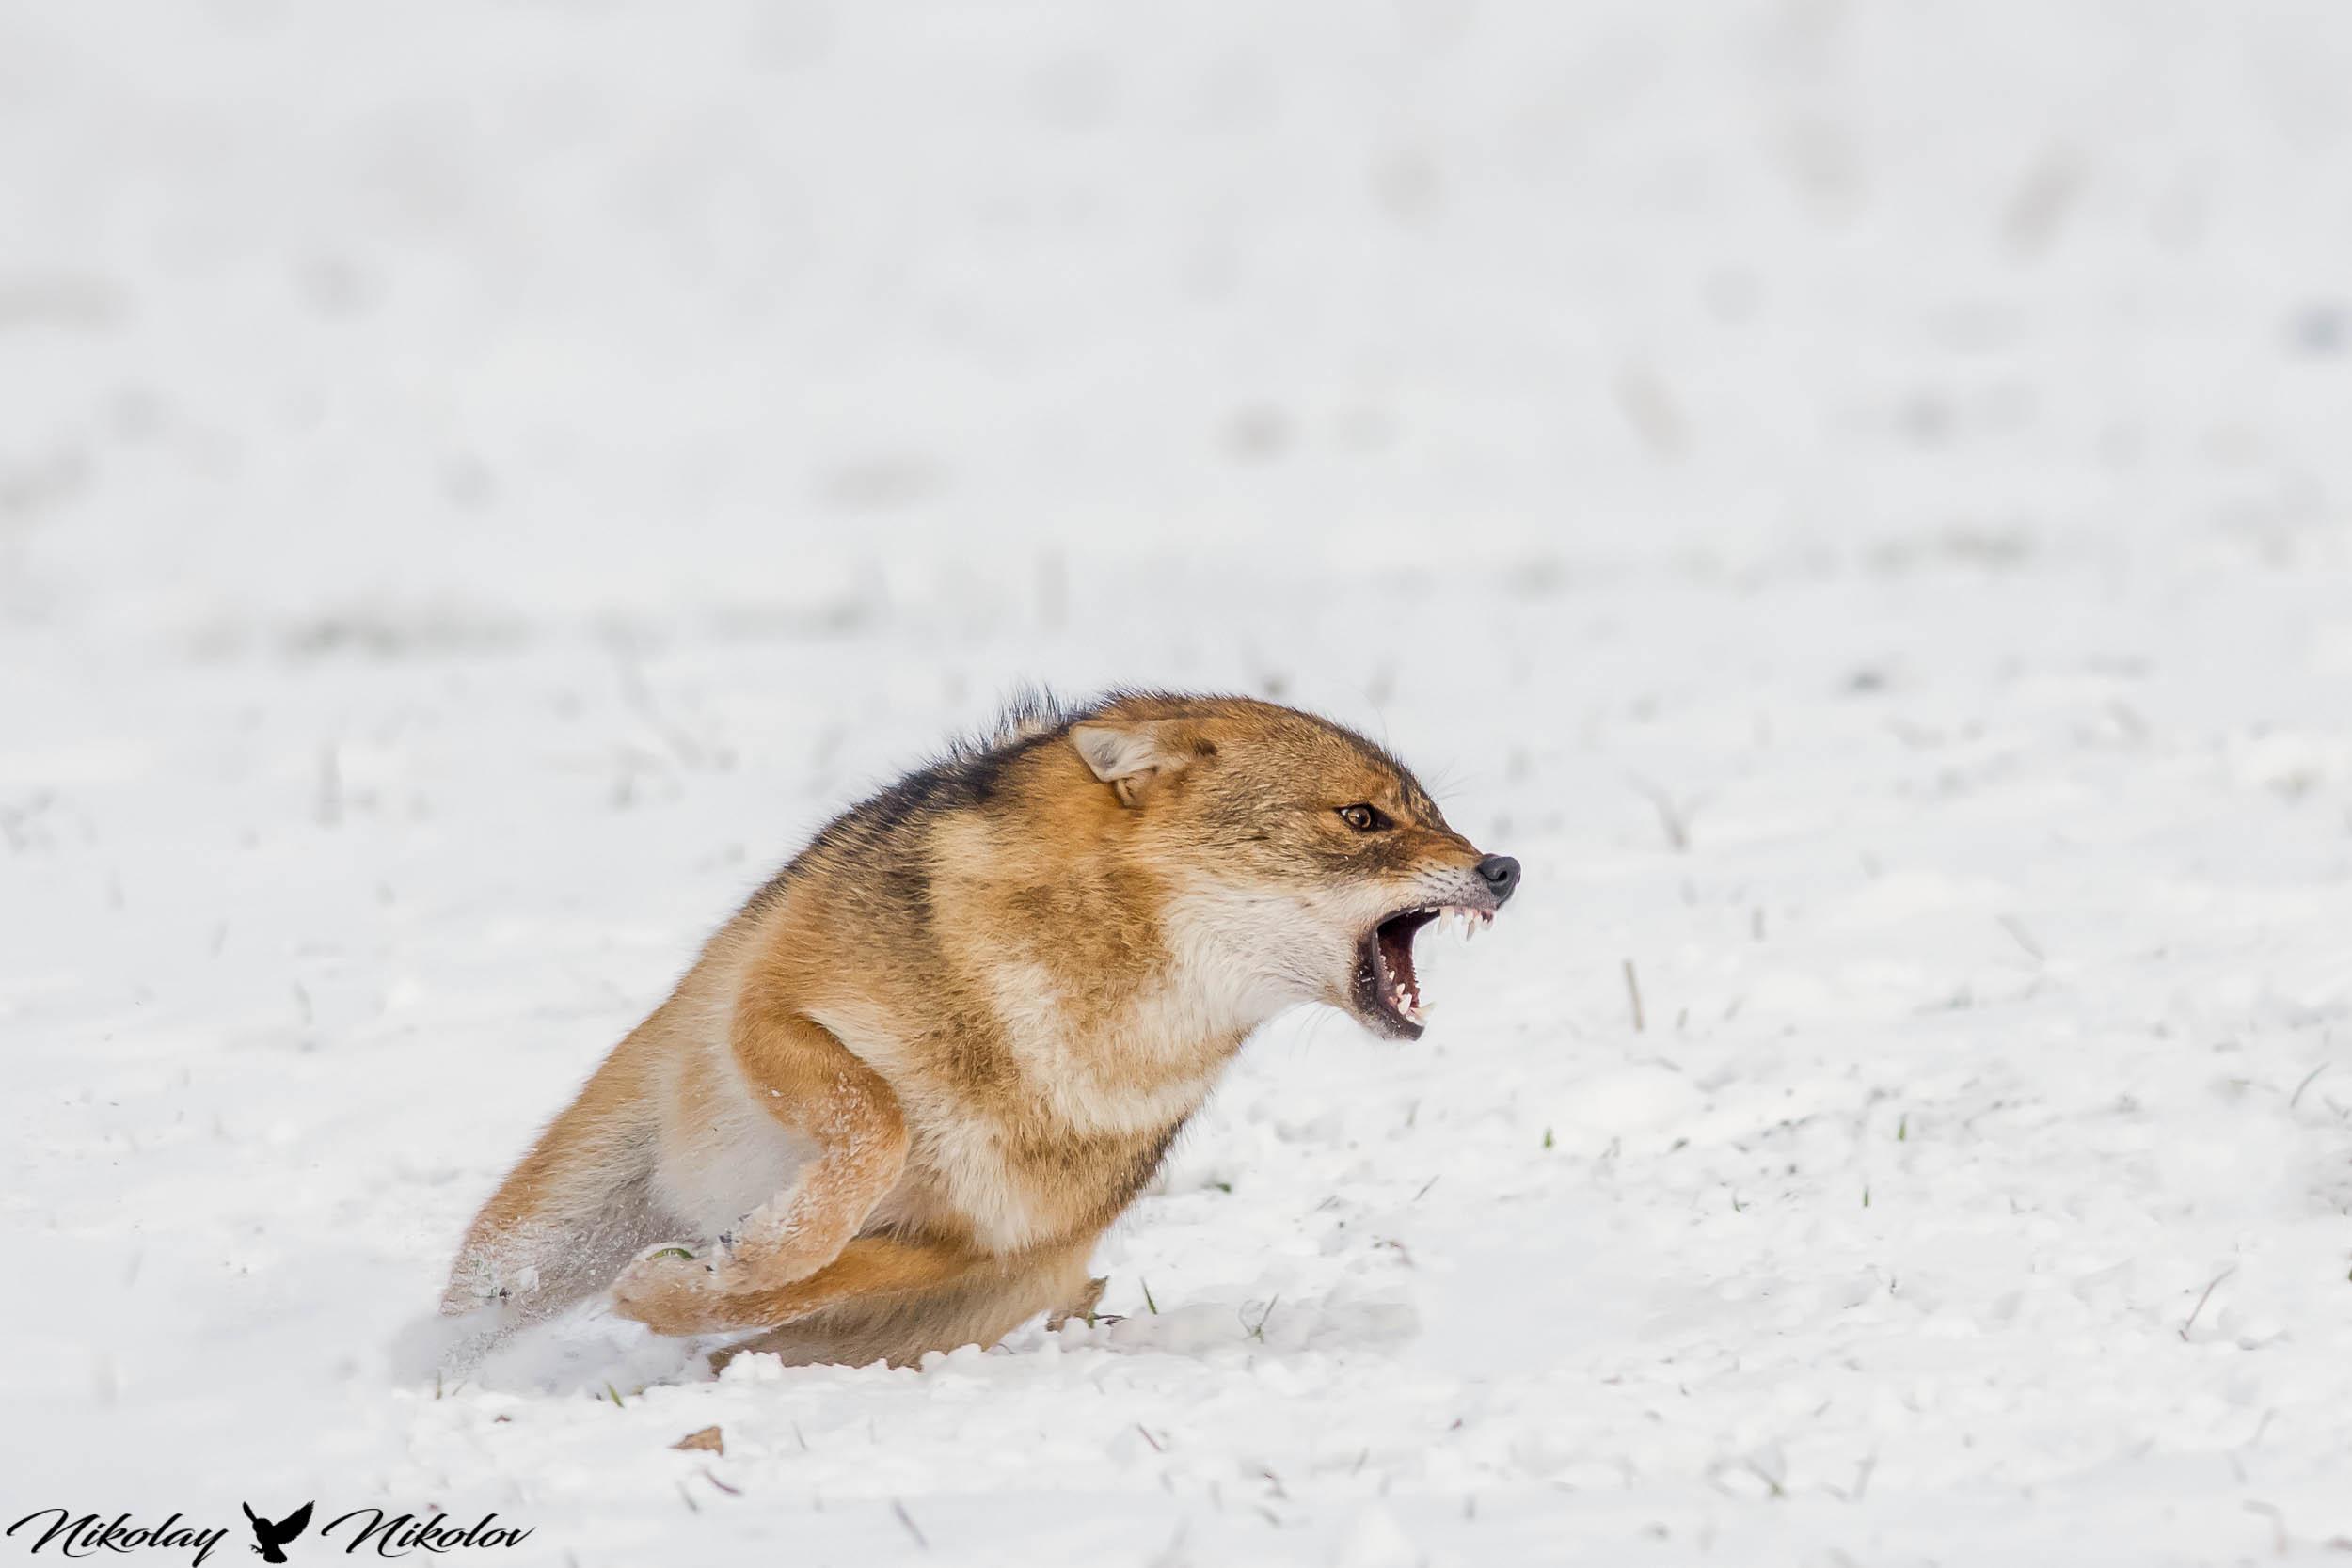 jackal,winter,snow,wildlife,landscape,run,action,fury,range, Nikolay Nikolov